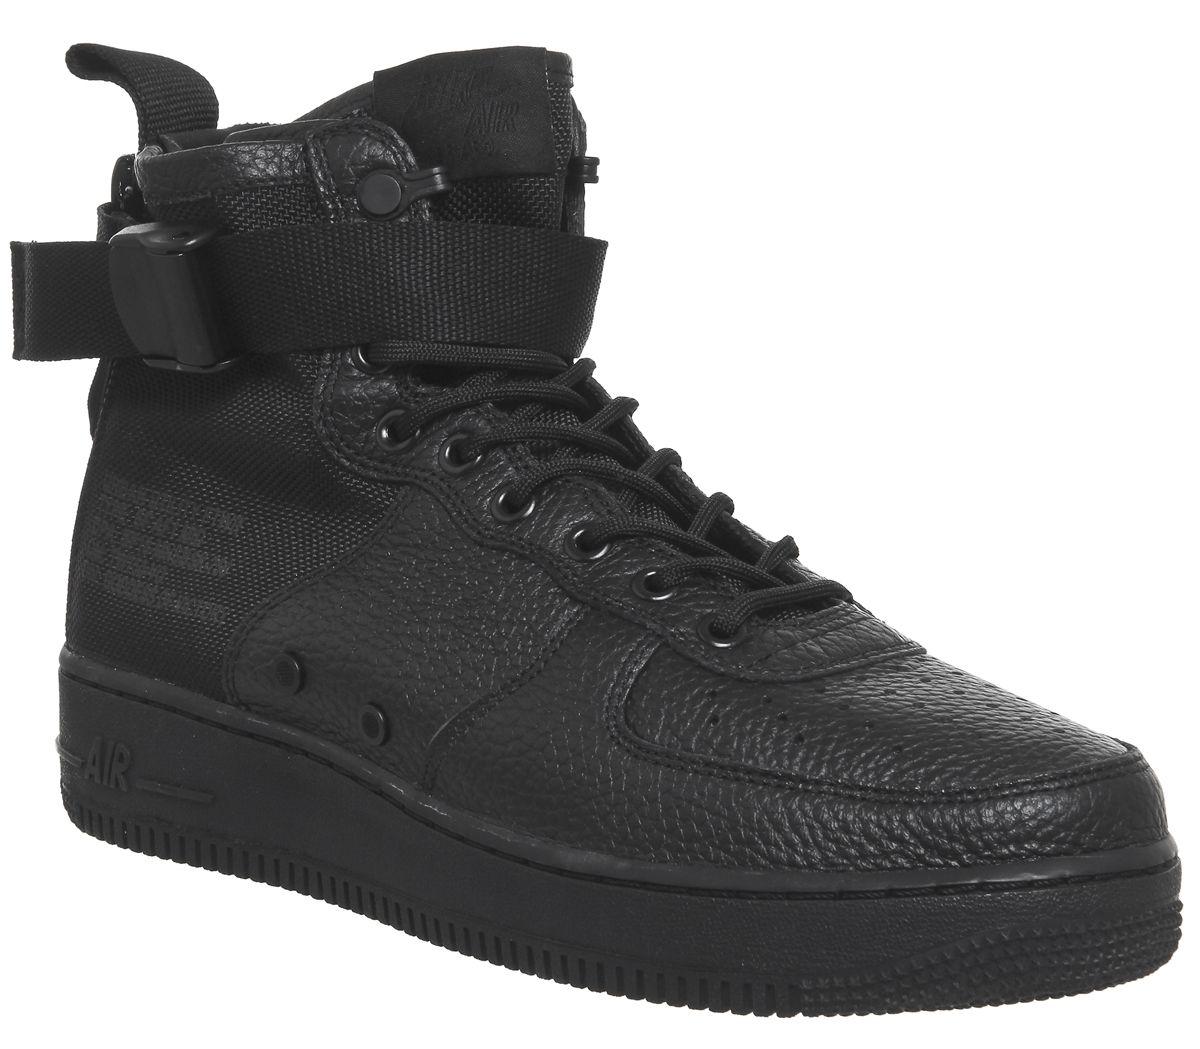 premium selection 6547b 8e2b0 Nike Sf Af1 Mid 17 Black - His trainers